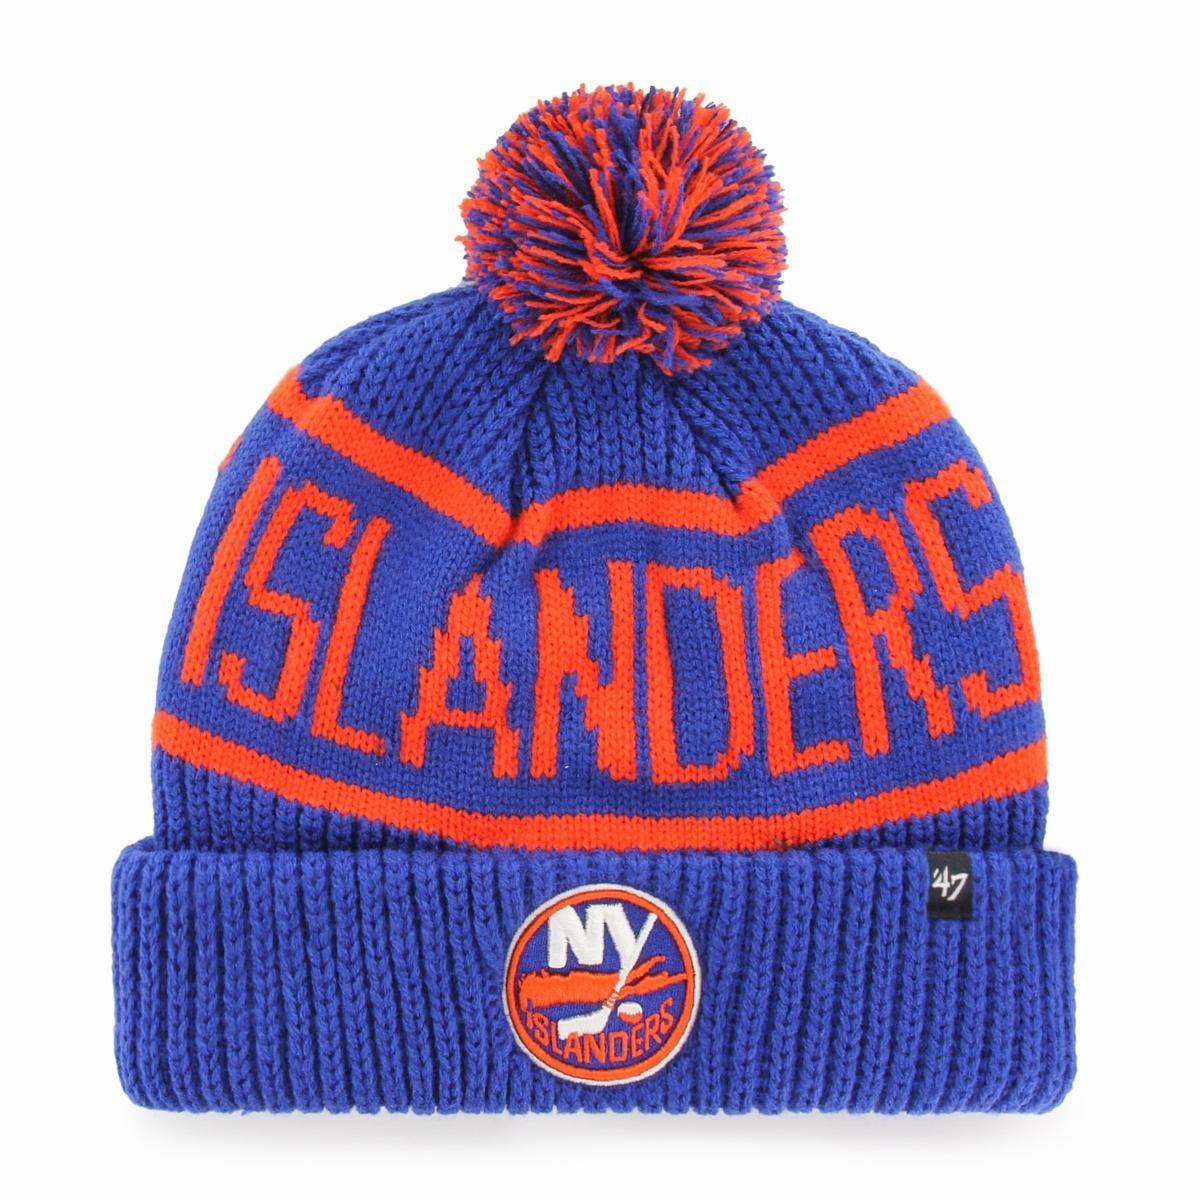 BRAND 47 New York Islanders Calgary Cuff Knit Winter Hat